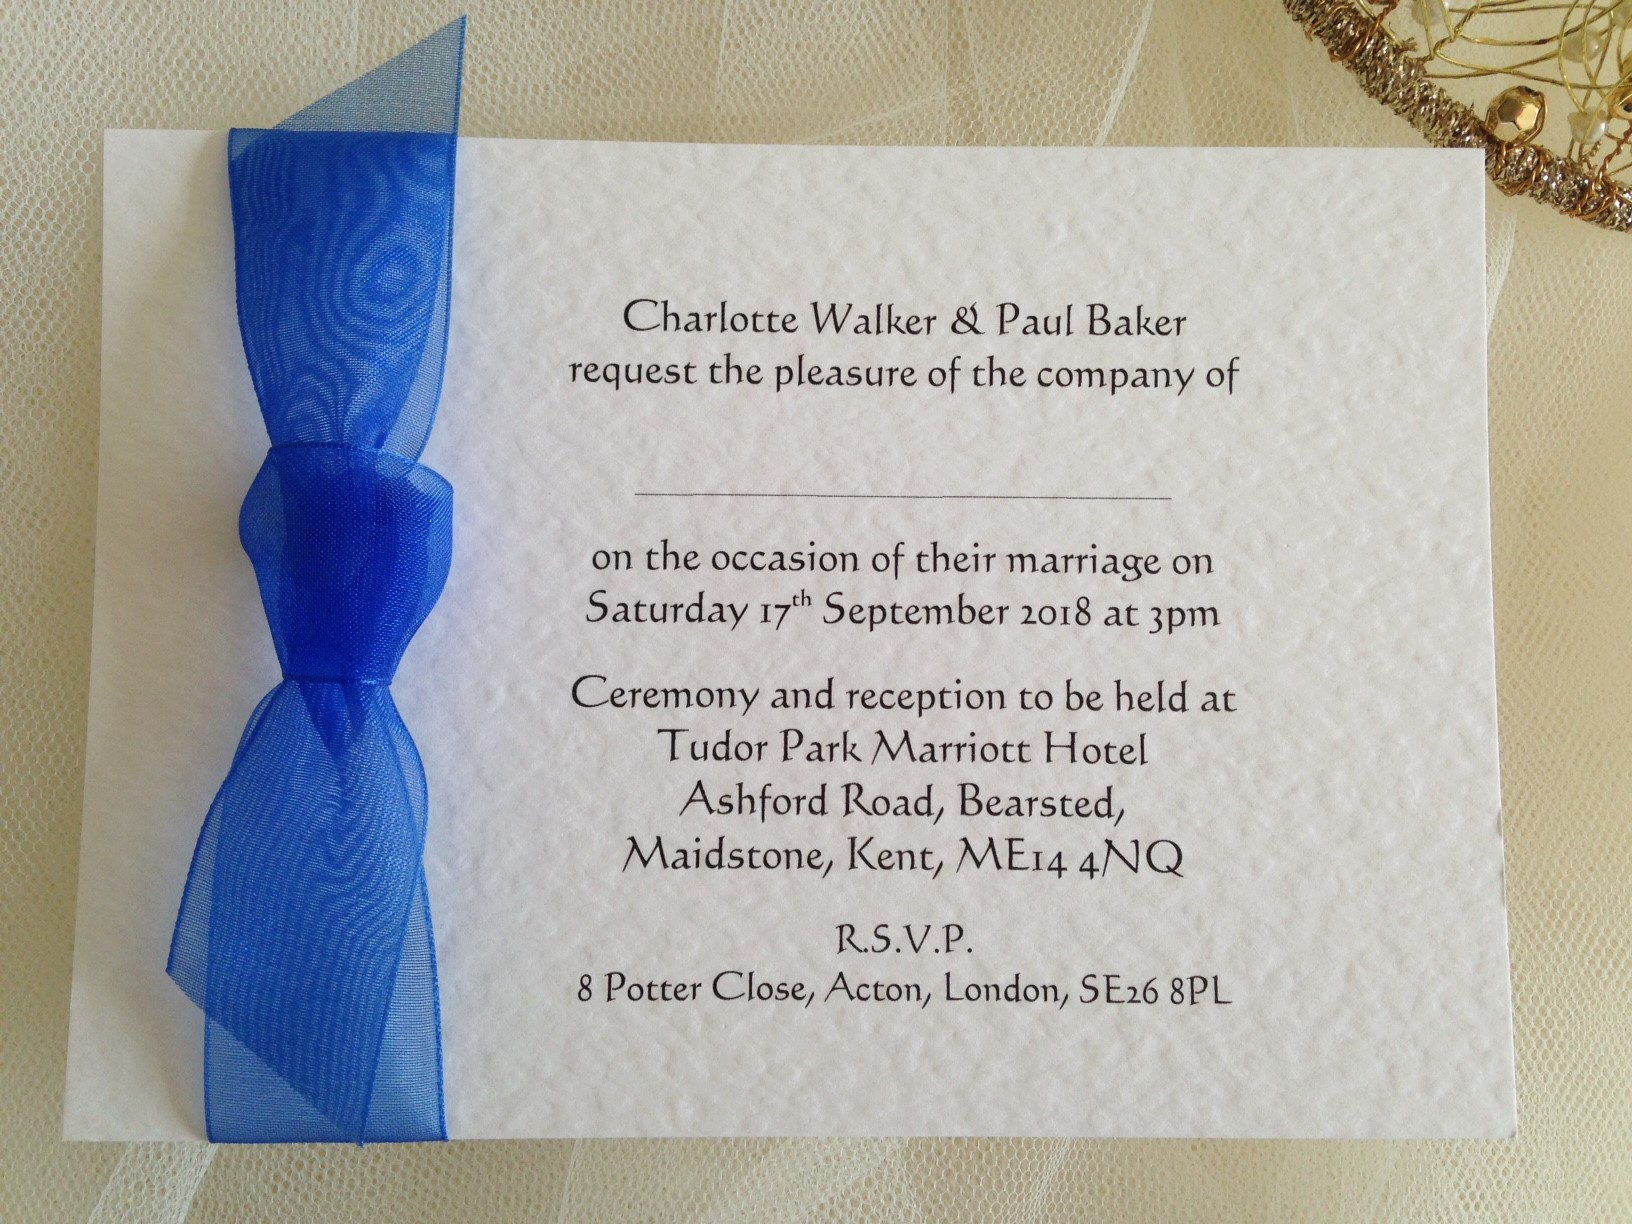 Beau Wedding Invitations Under £1